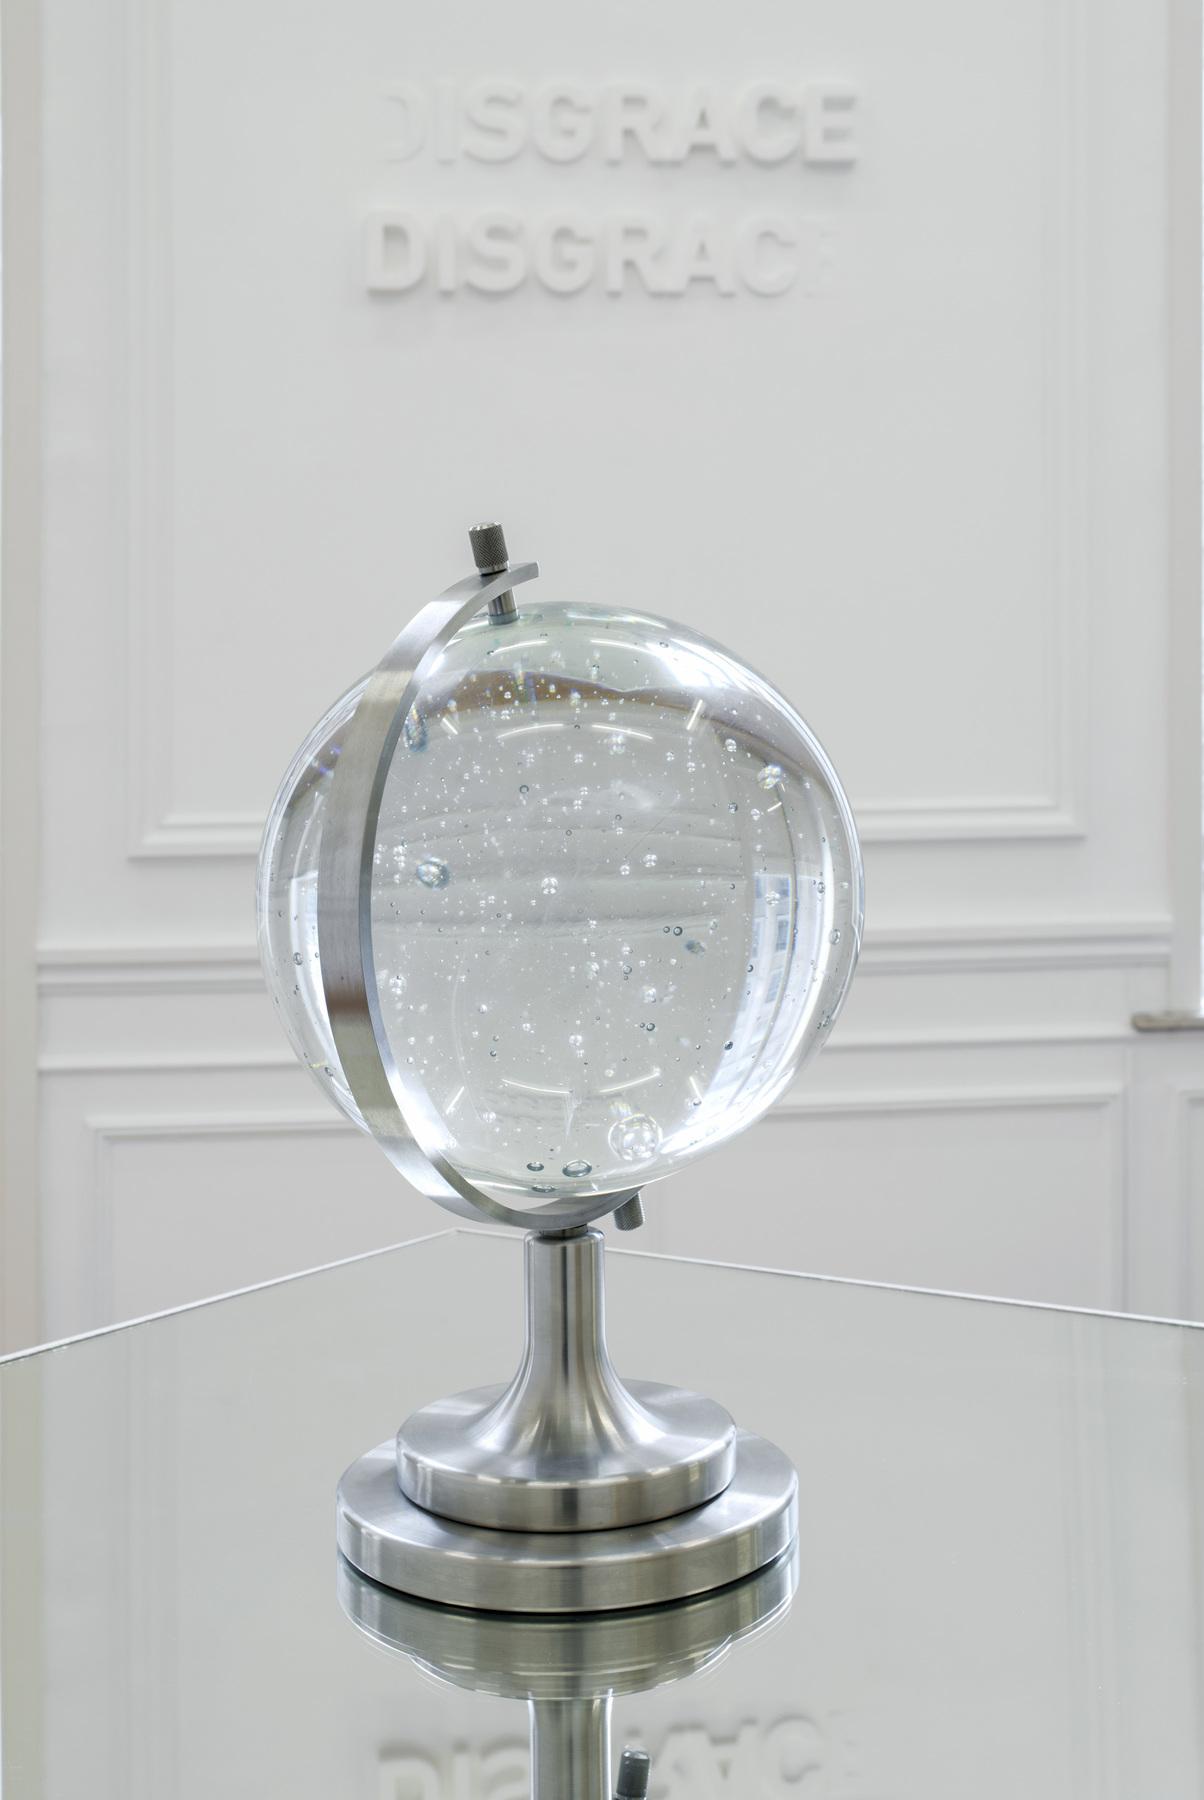 Melik Ohanian, Futuring (cosmos), 2011, Glass, metal, mirror, Glass ball Ø 30 cm, Pedestal and mirror 100 x 100 x 100cm, 1_3 (02)